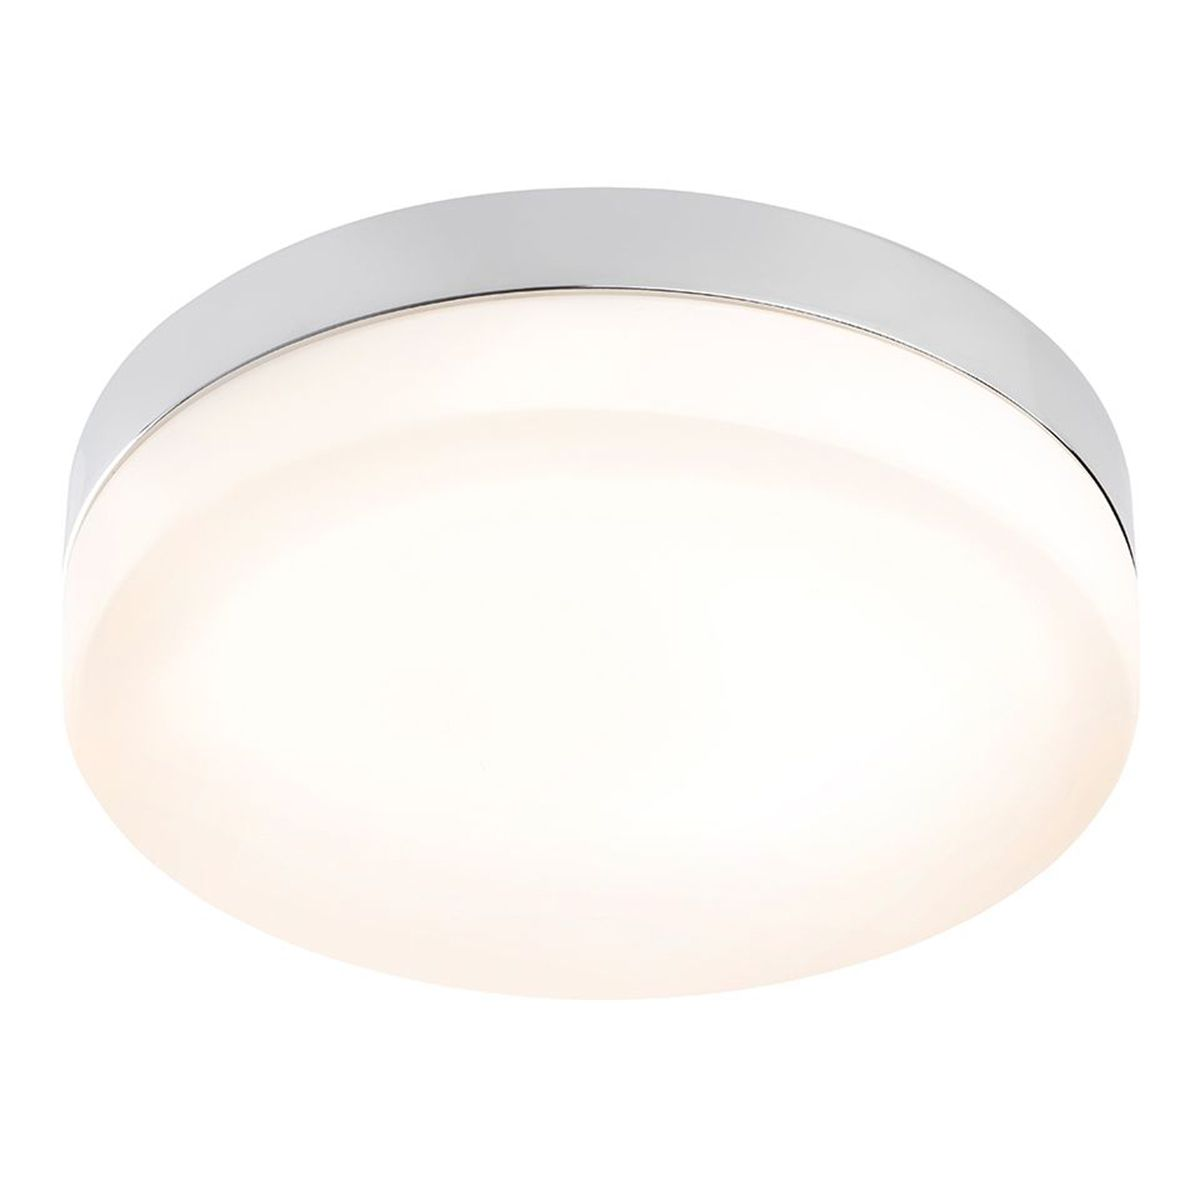 Sensio Hudson Flat Round LED Ceiling Light